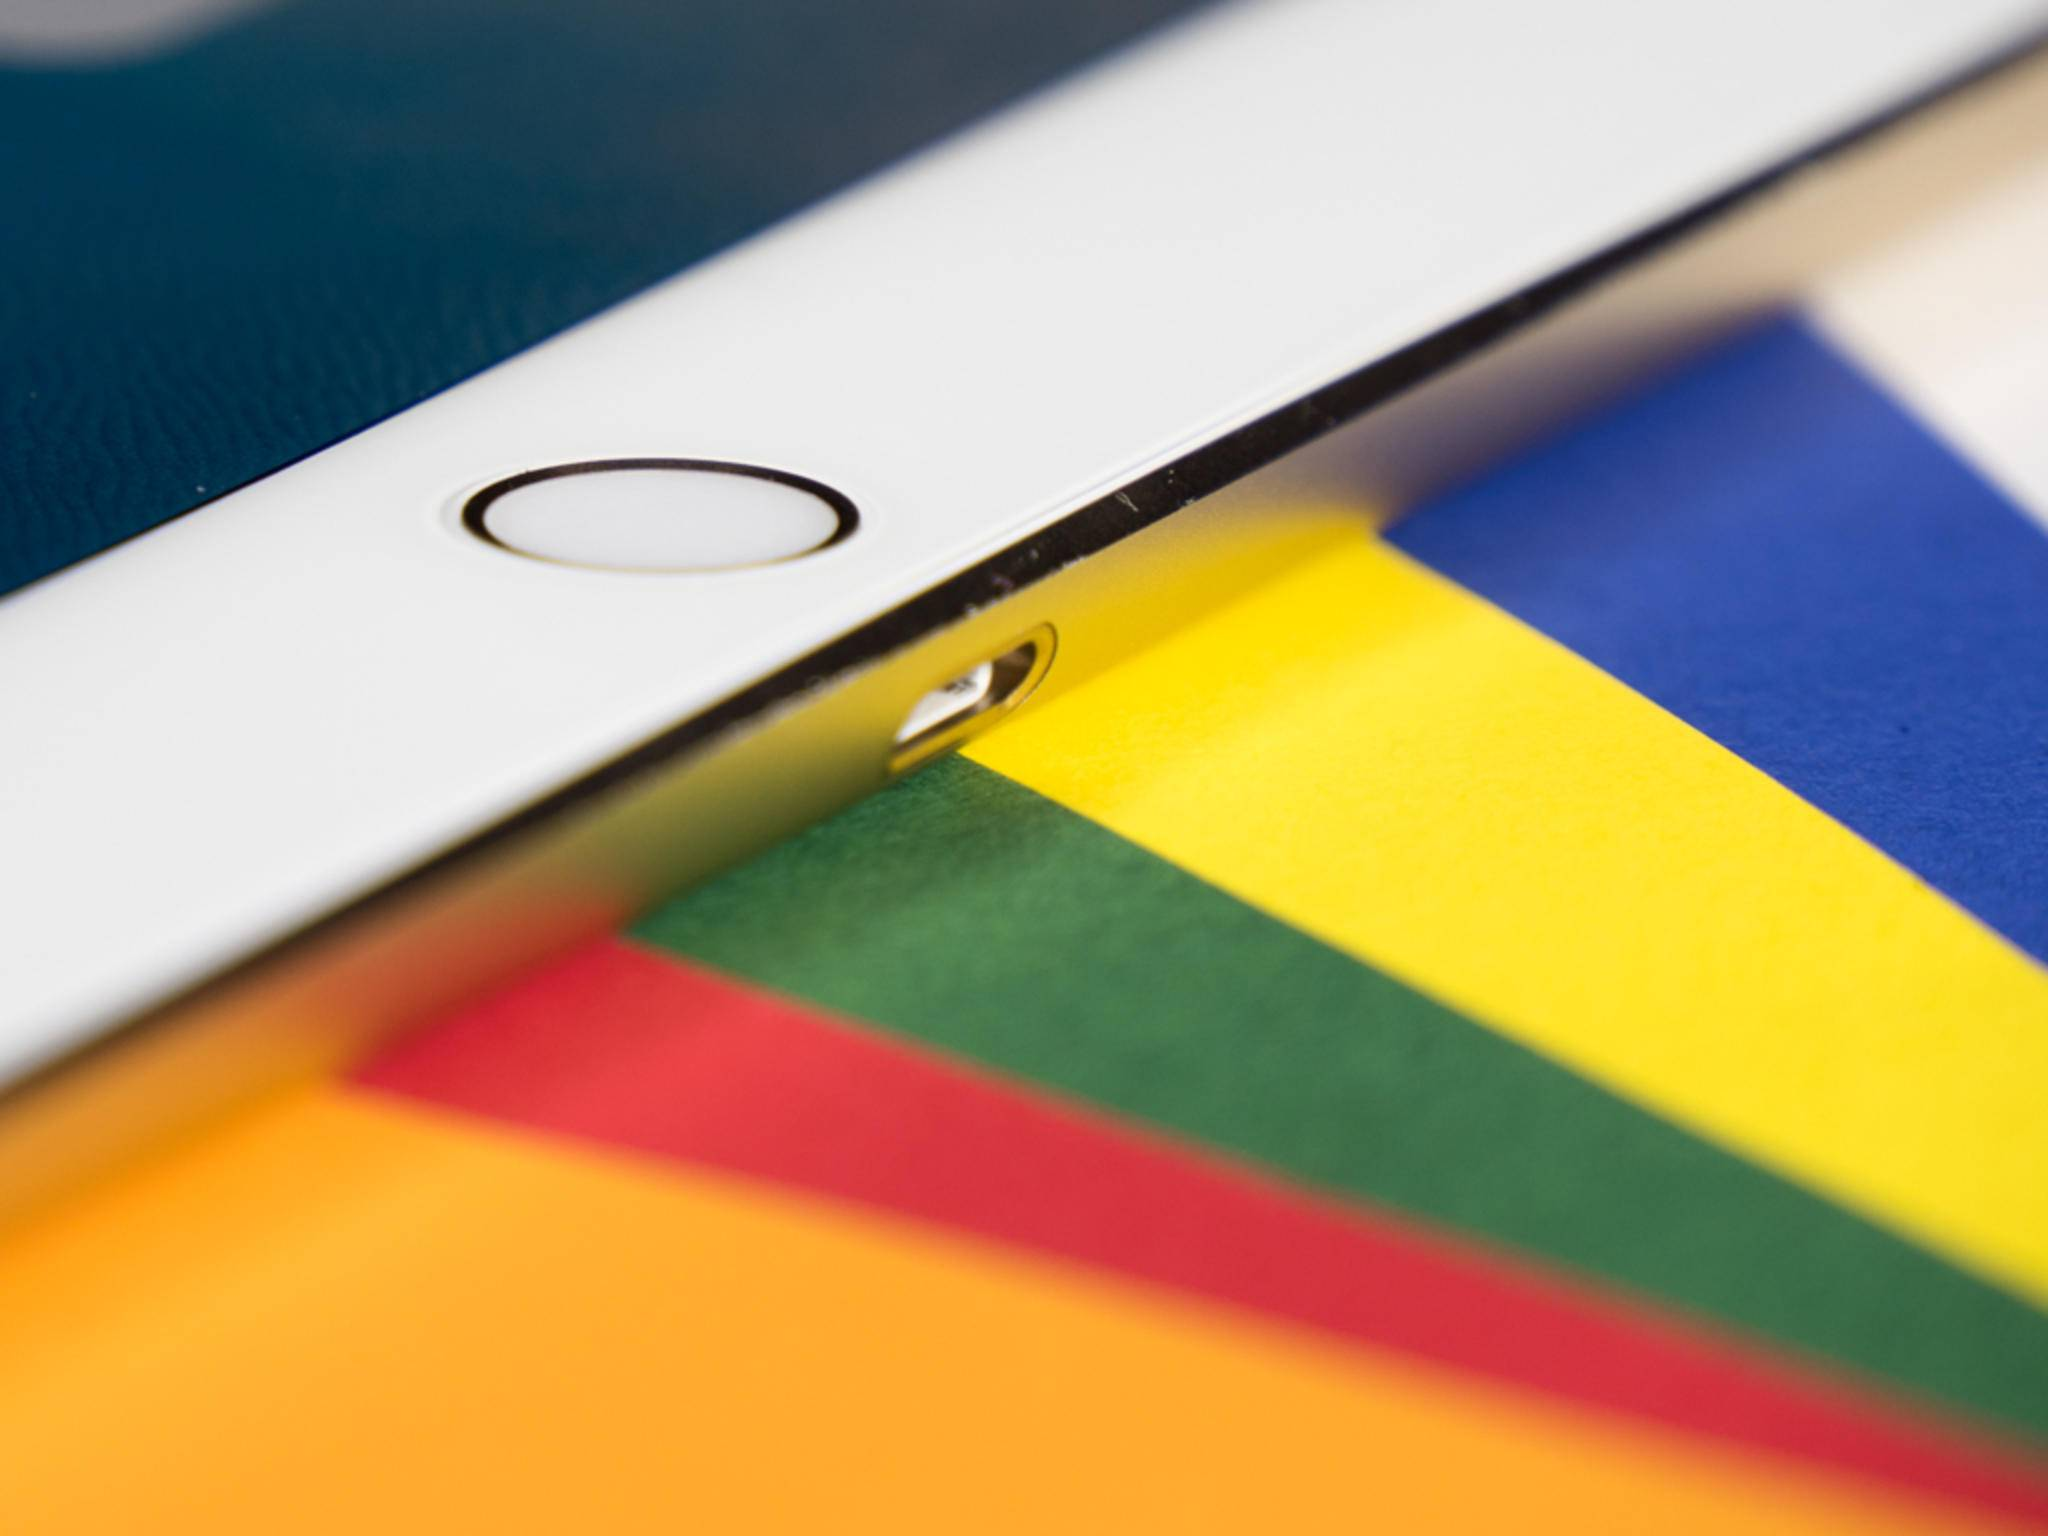 Der Home-Button des iPad Pro.